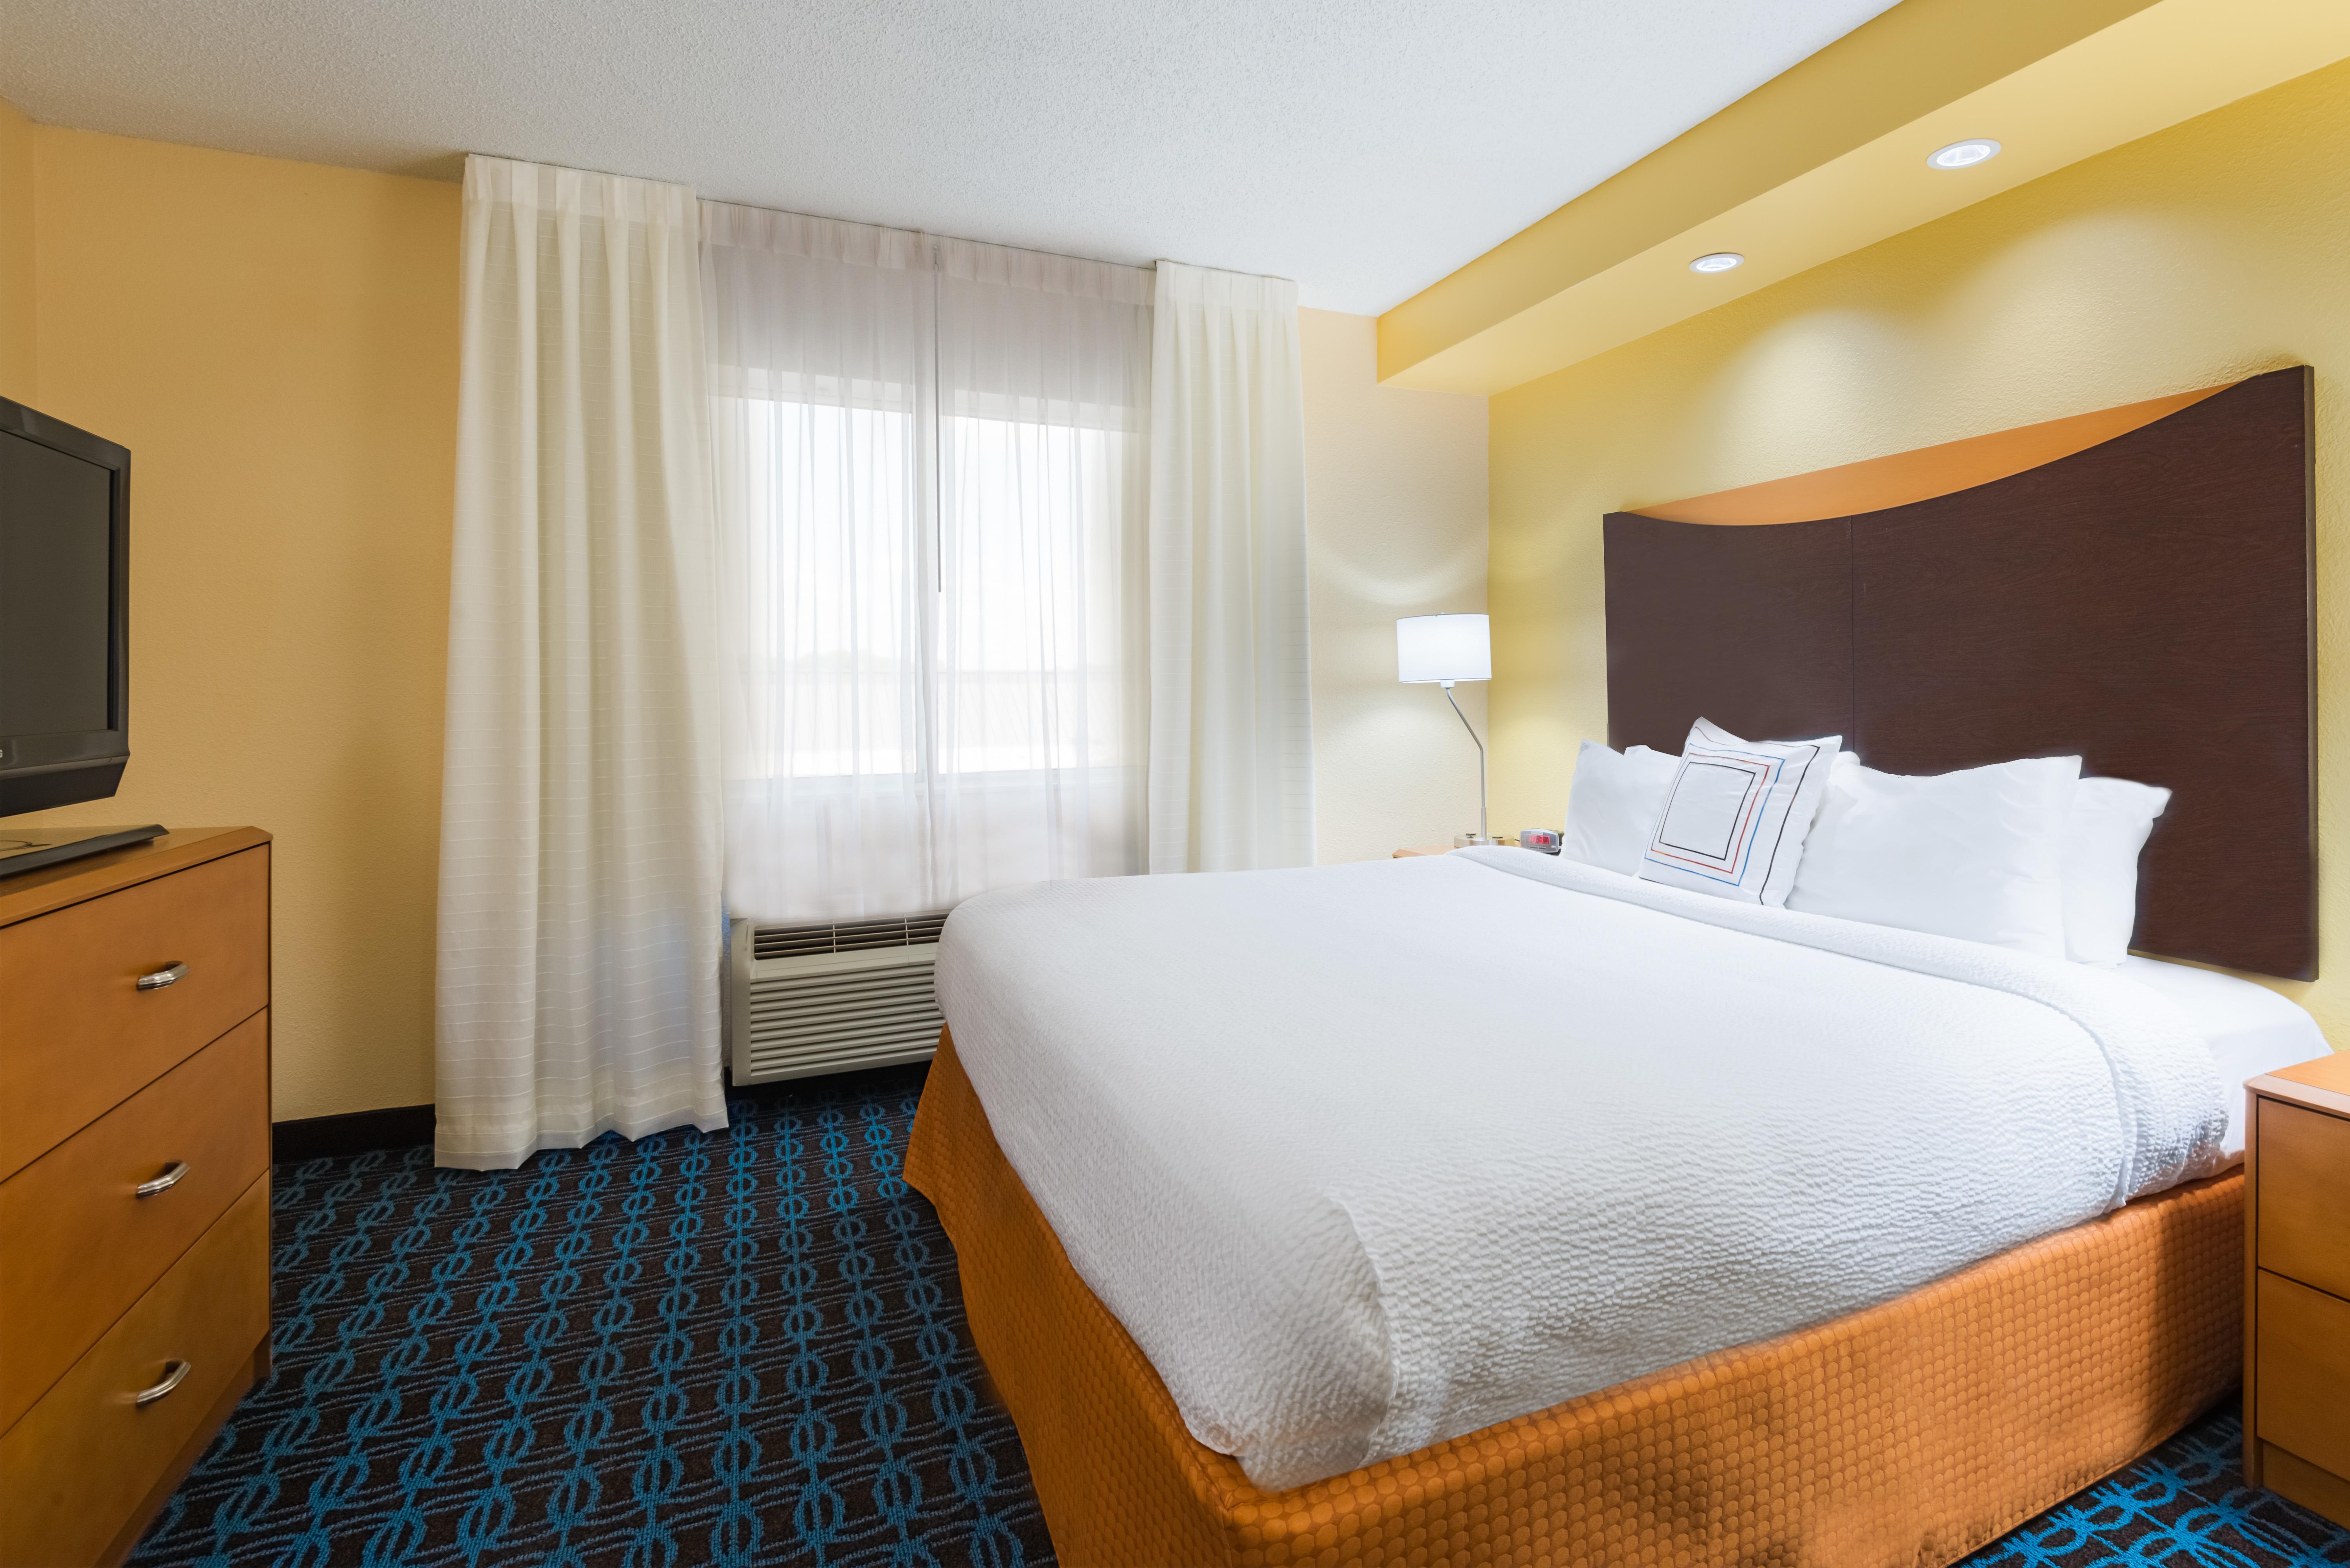 Fairfield Inn & Suites by Marriott Mobile image 8